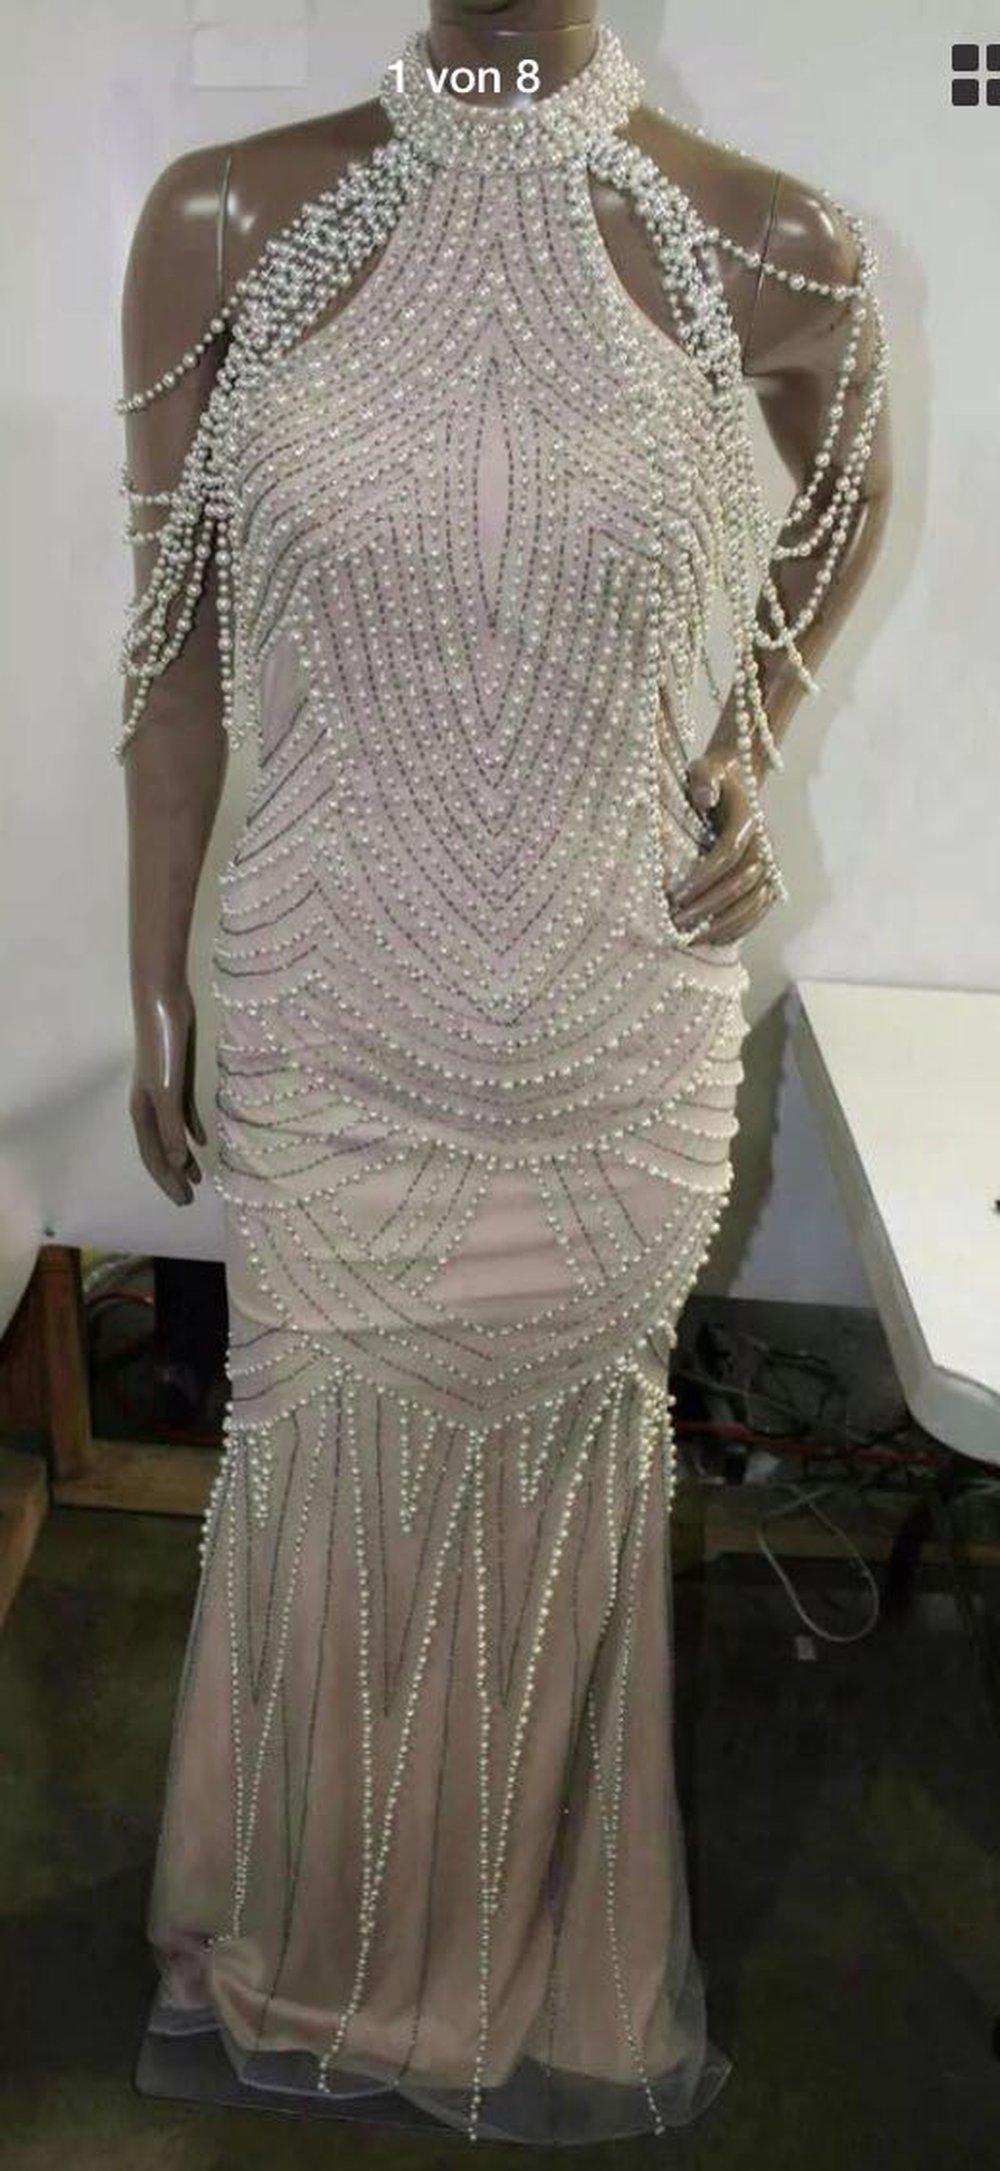 jovani - Jovani Couture Abendkleid verlobungskleid abiball Ballkleid ...